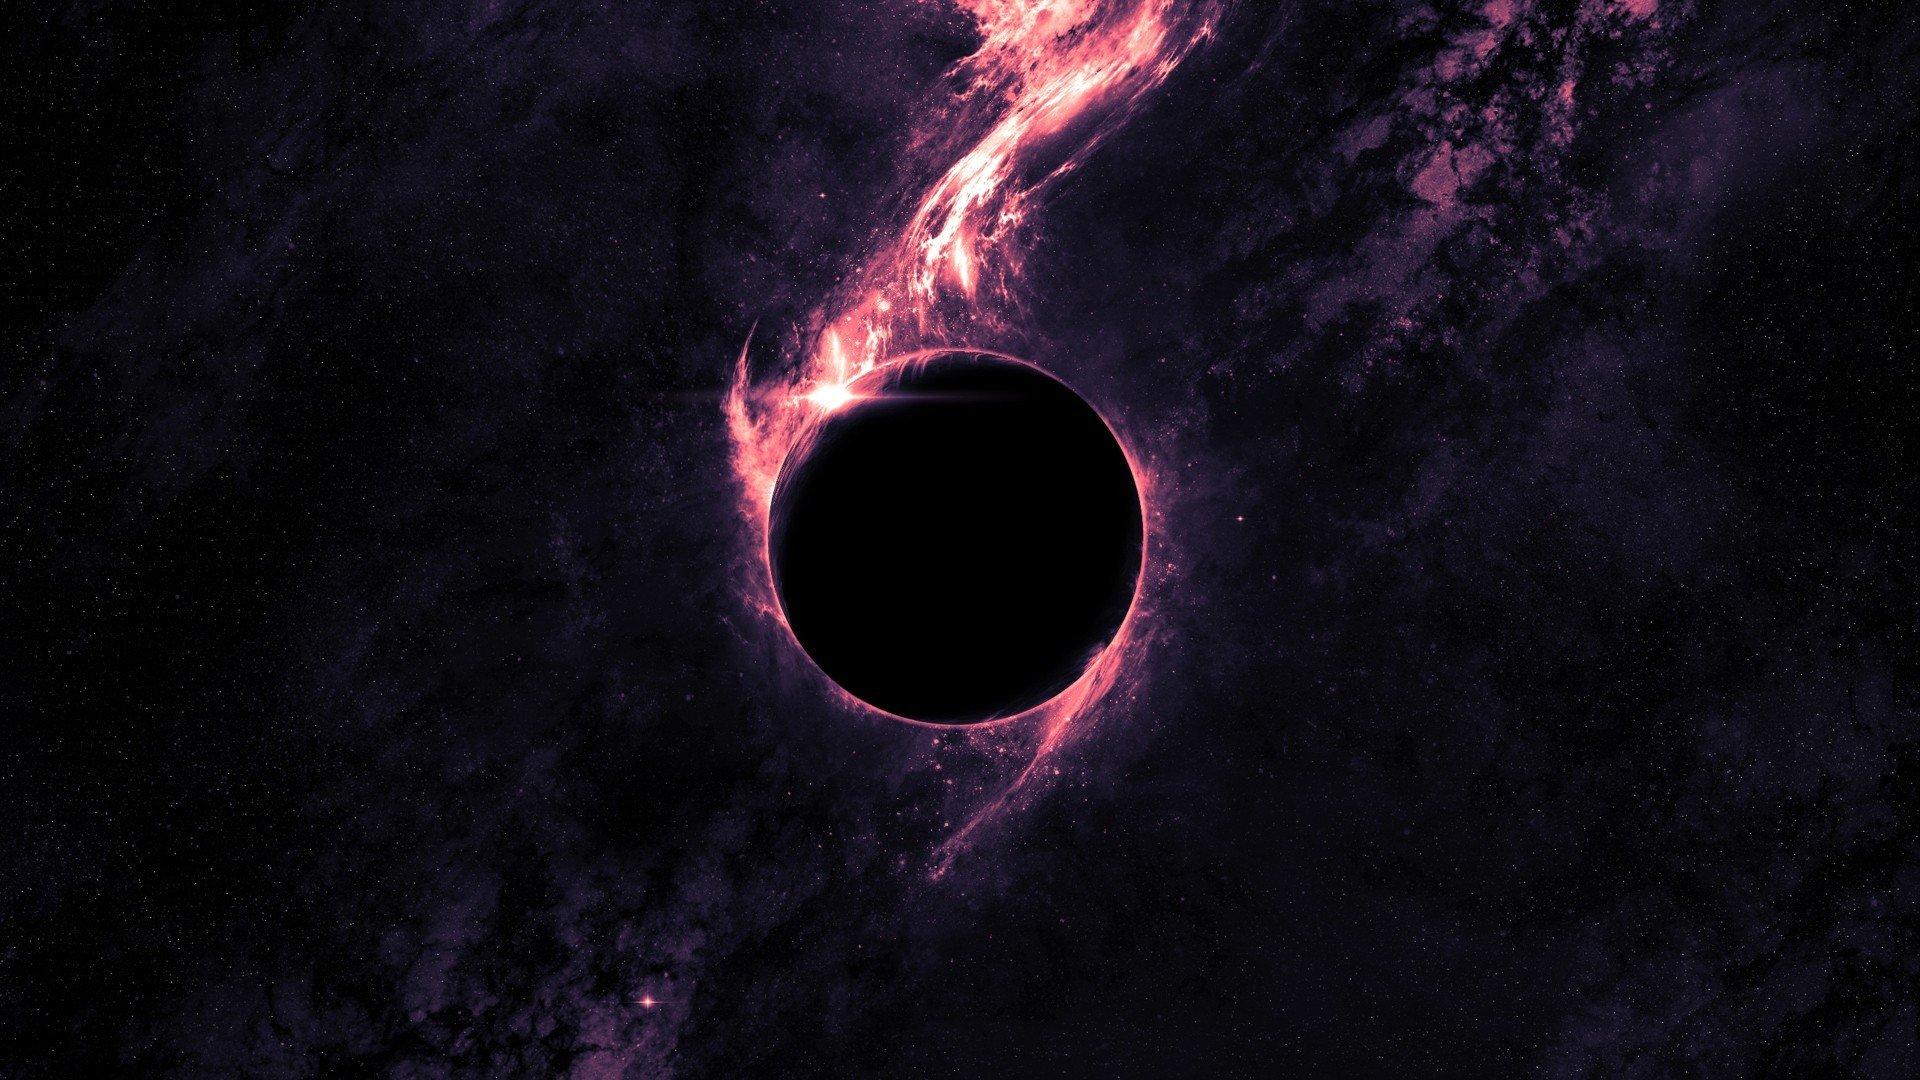 Purple Space Black Holes Galaxy Digital Art Space Art Artwork